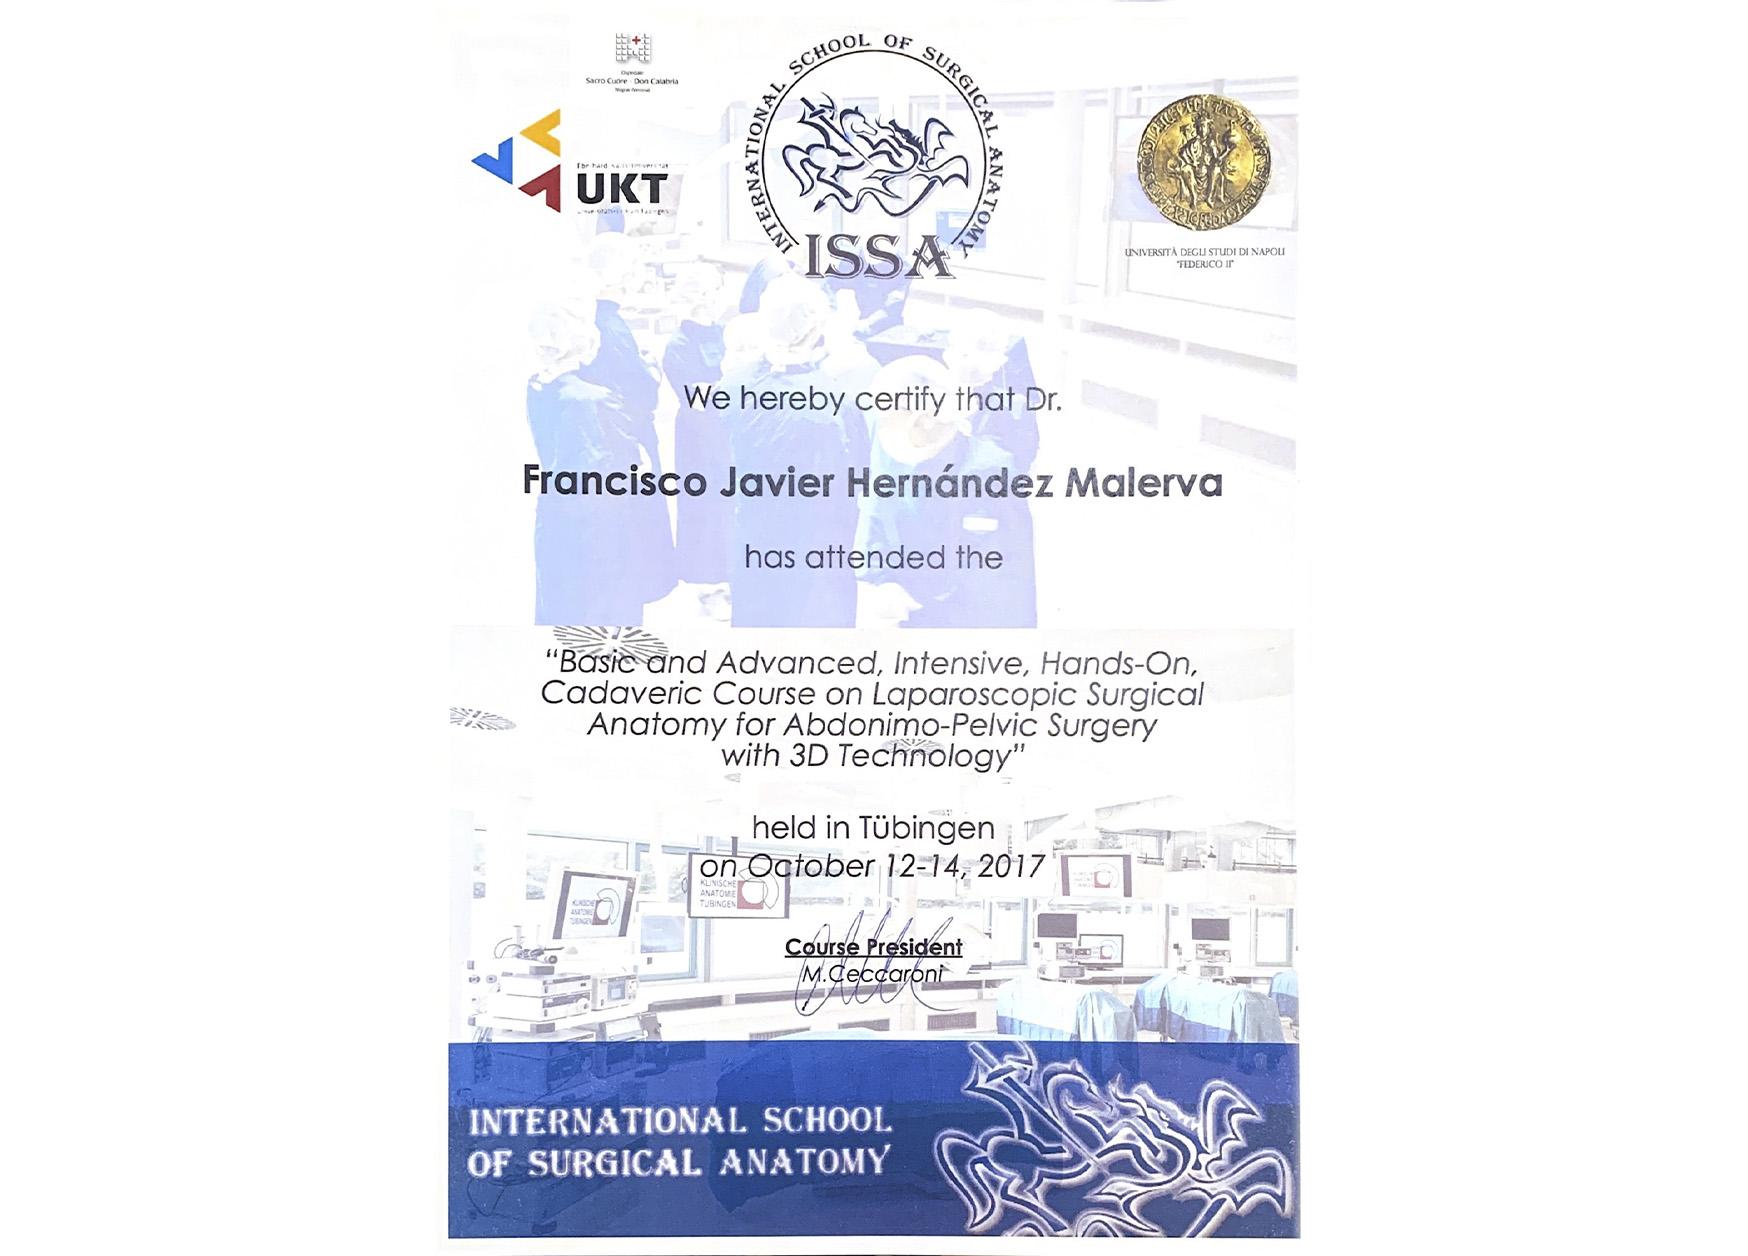 Curriculum - Ginecólogo en Guadalajara - Dr. Francisco J. Malerva